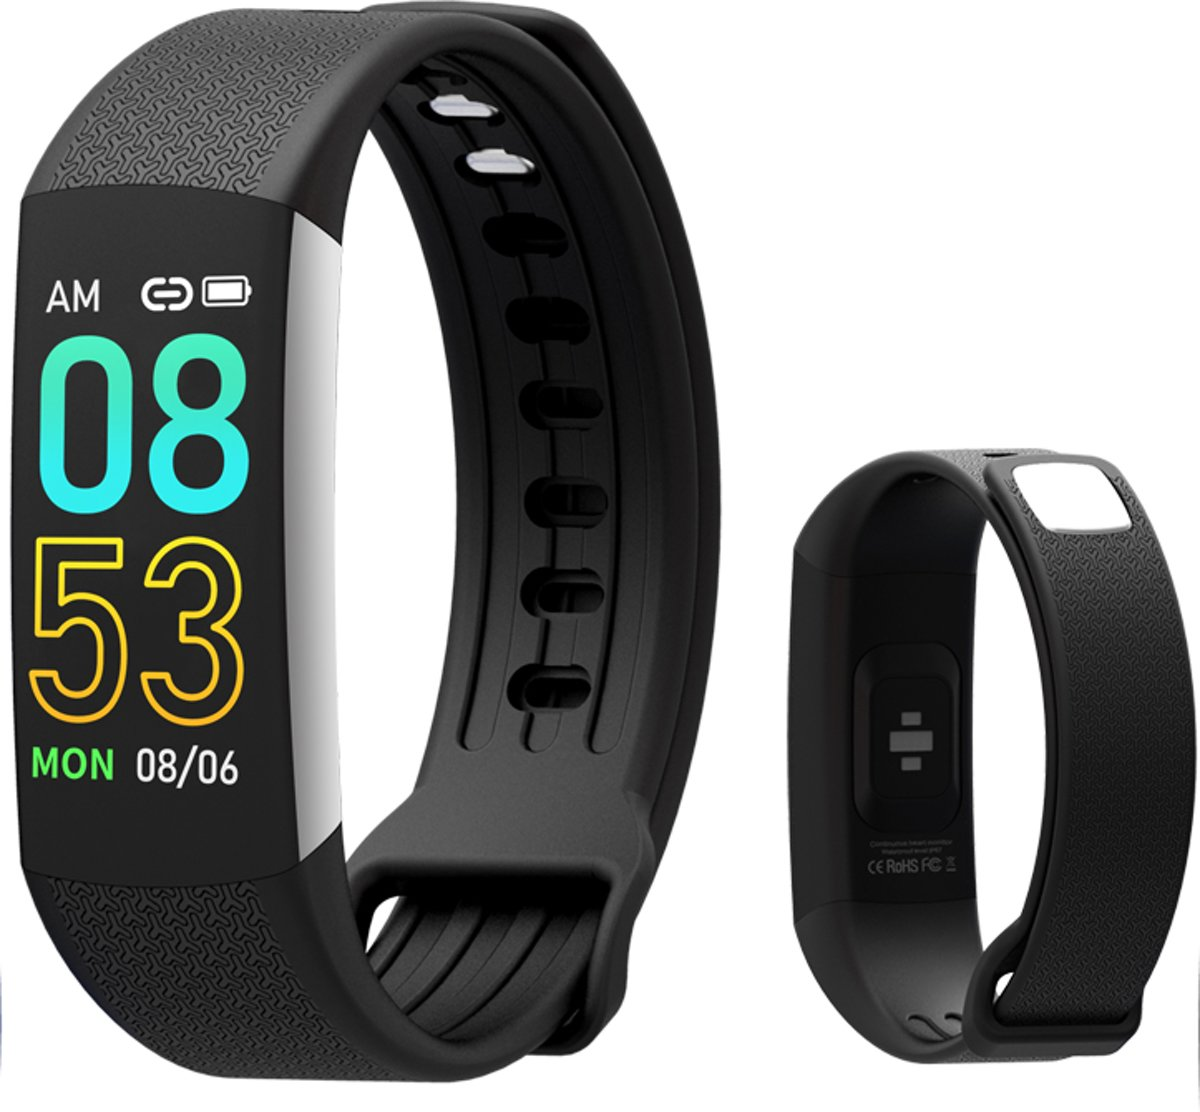 Smartband, Activiteitstracker, Trackband, Gezonde lifestyle, hartslag monitor, alle gezondheidsdetails bijhouden, bluetoothkoppeling, Ideale gift, cadeau kopen